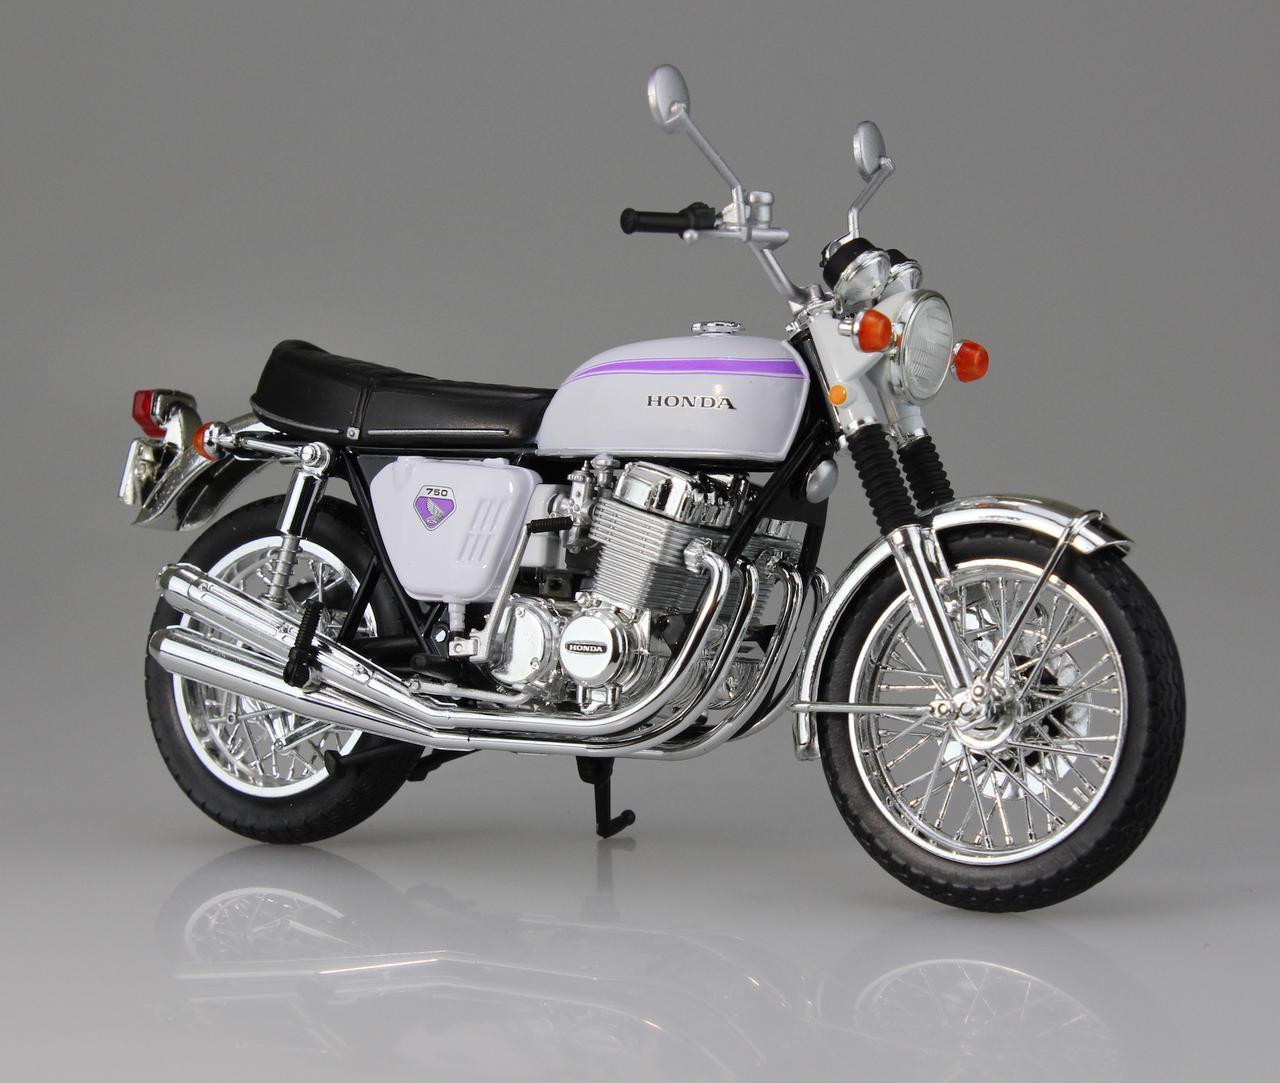 画像1: 1/12 完成品バイク Honda CB750FOUR(K0) 名古屋カラー ■本体価格:2000円